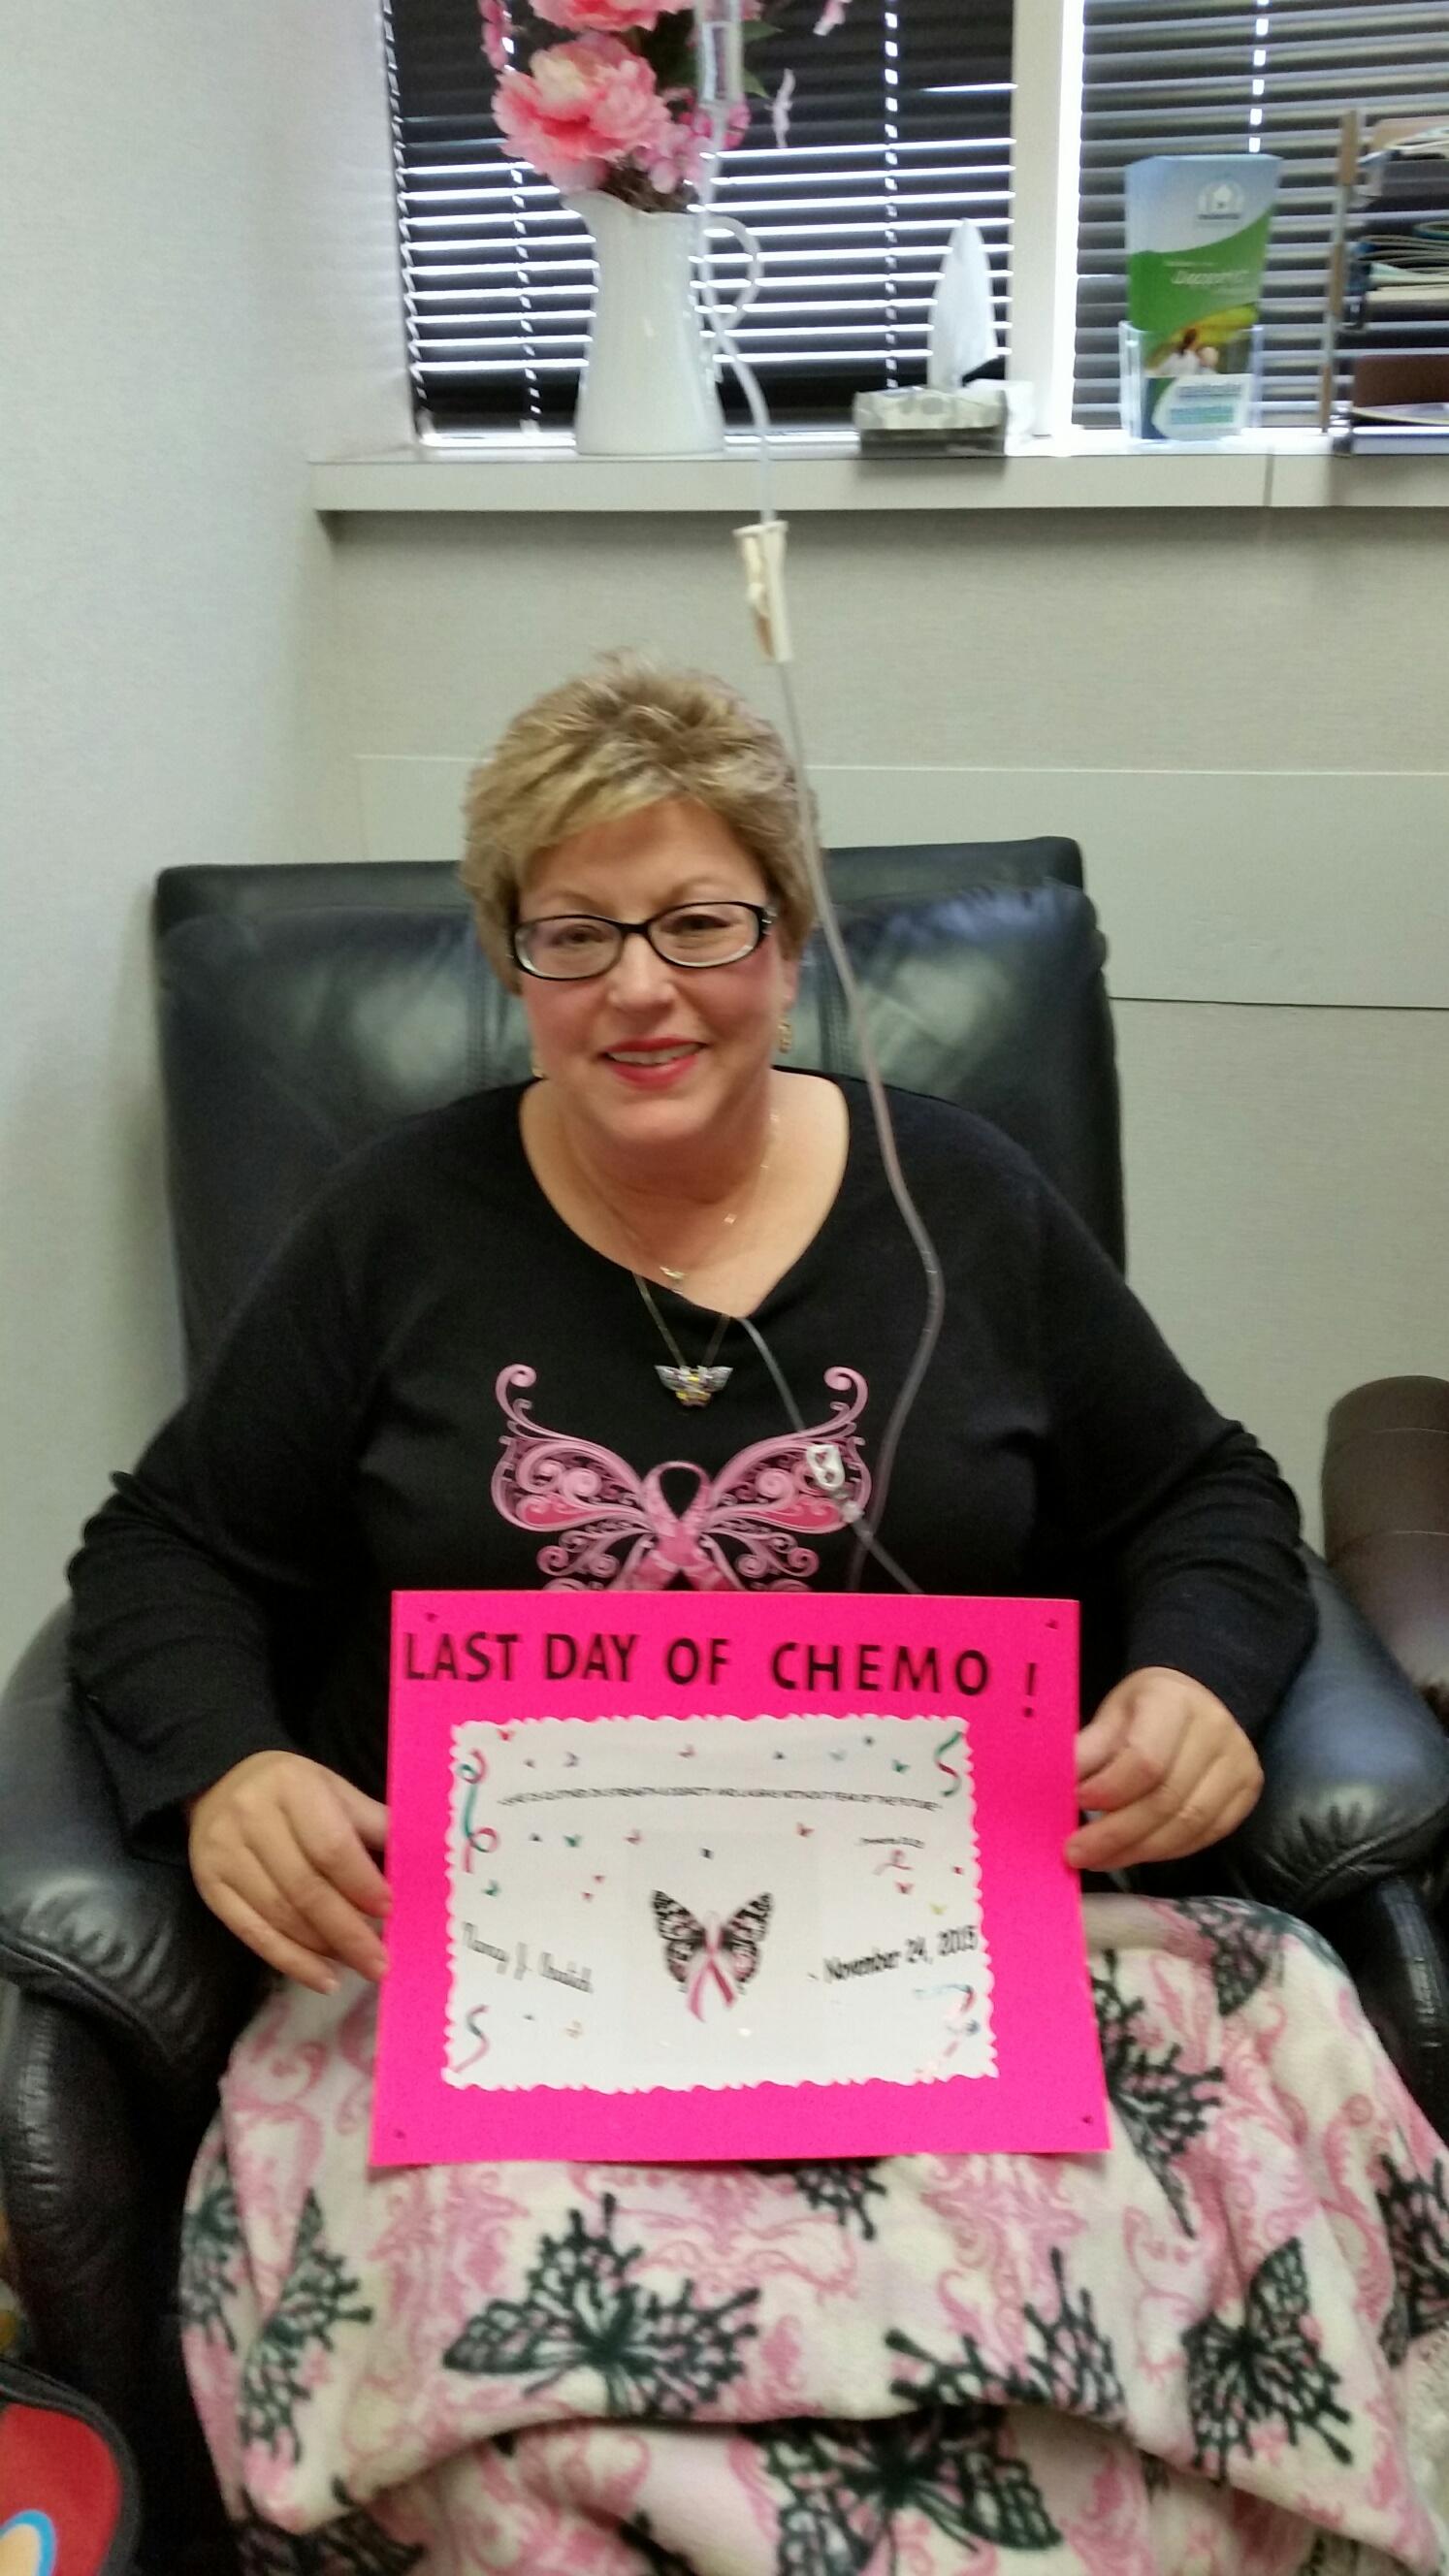 Nancy beat cancer!